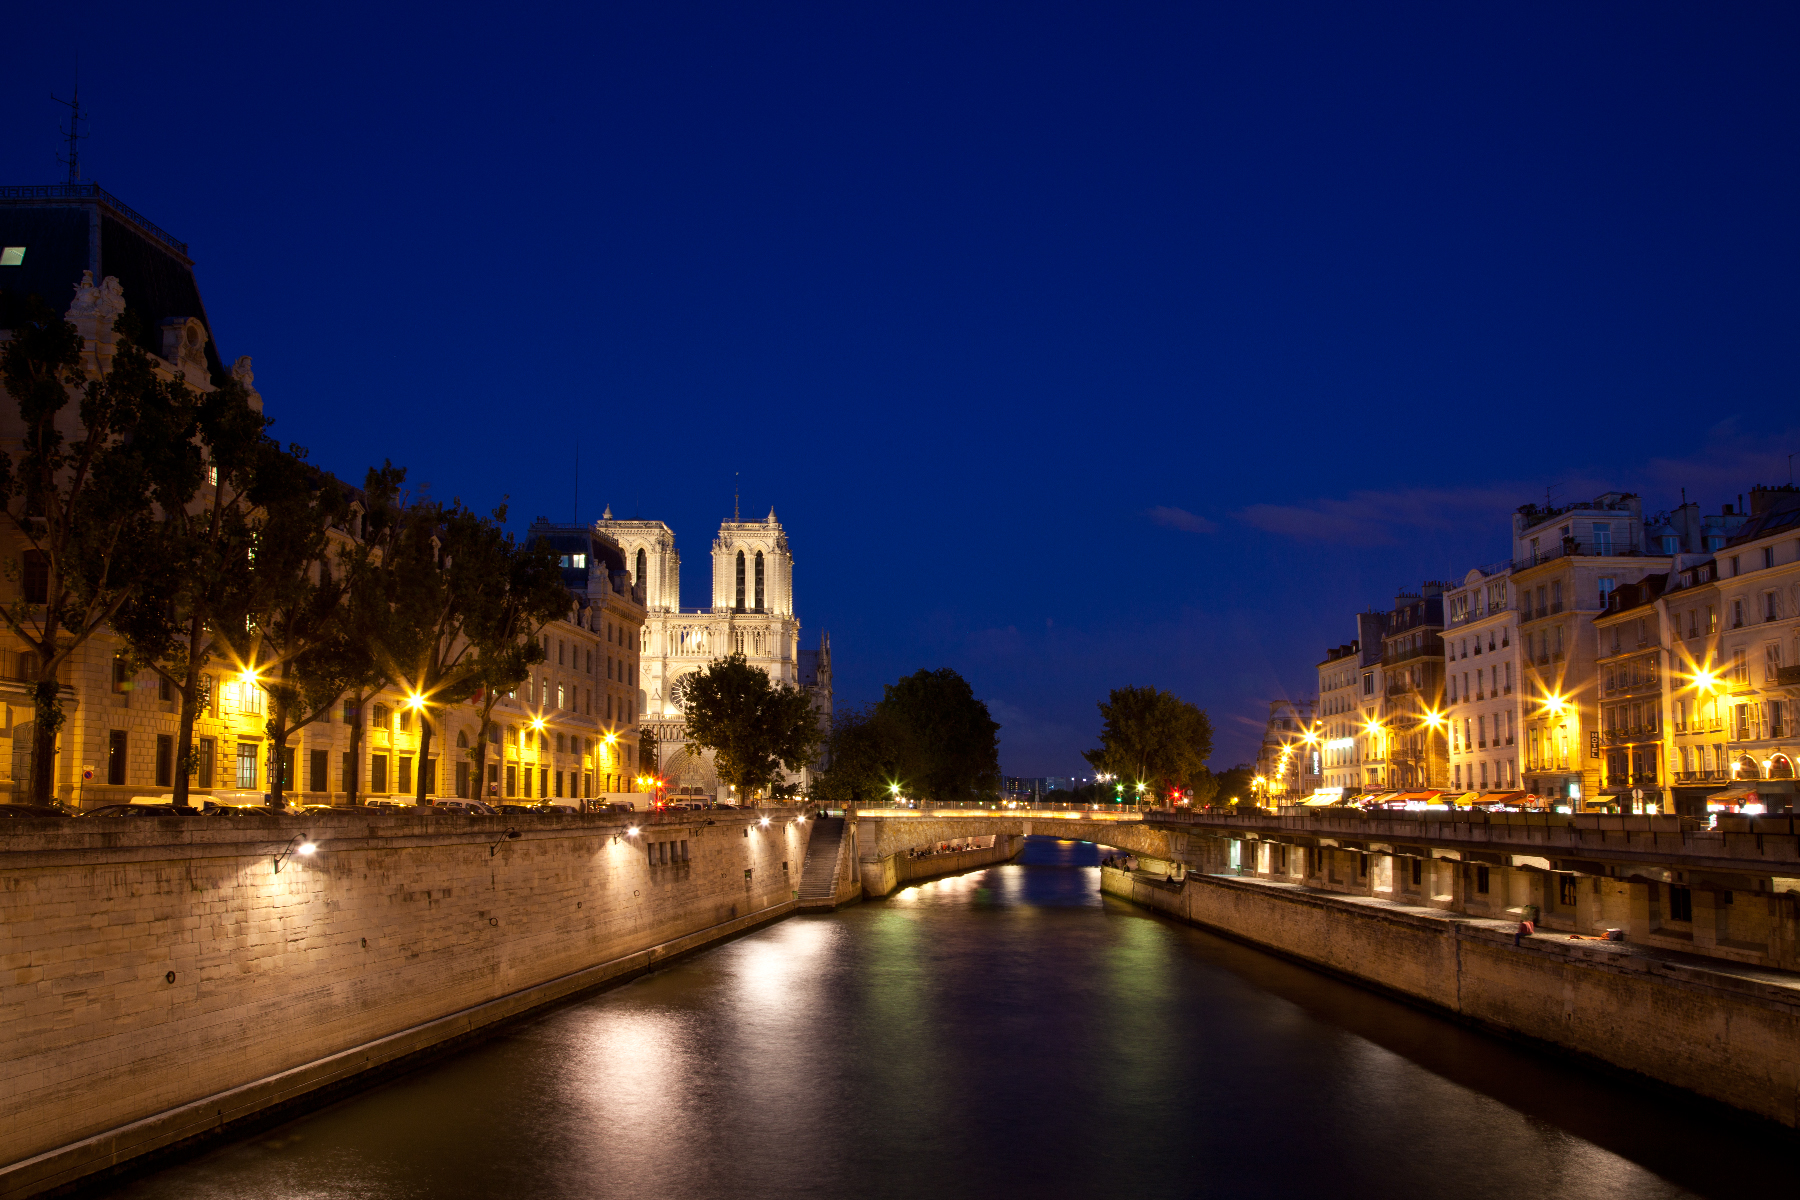 Paris sur seine twilight photo